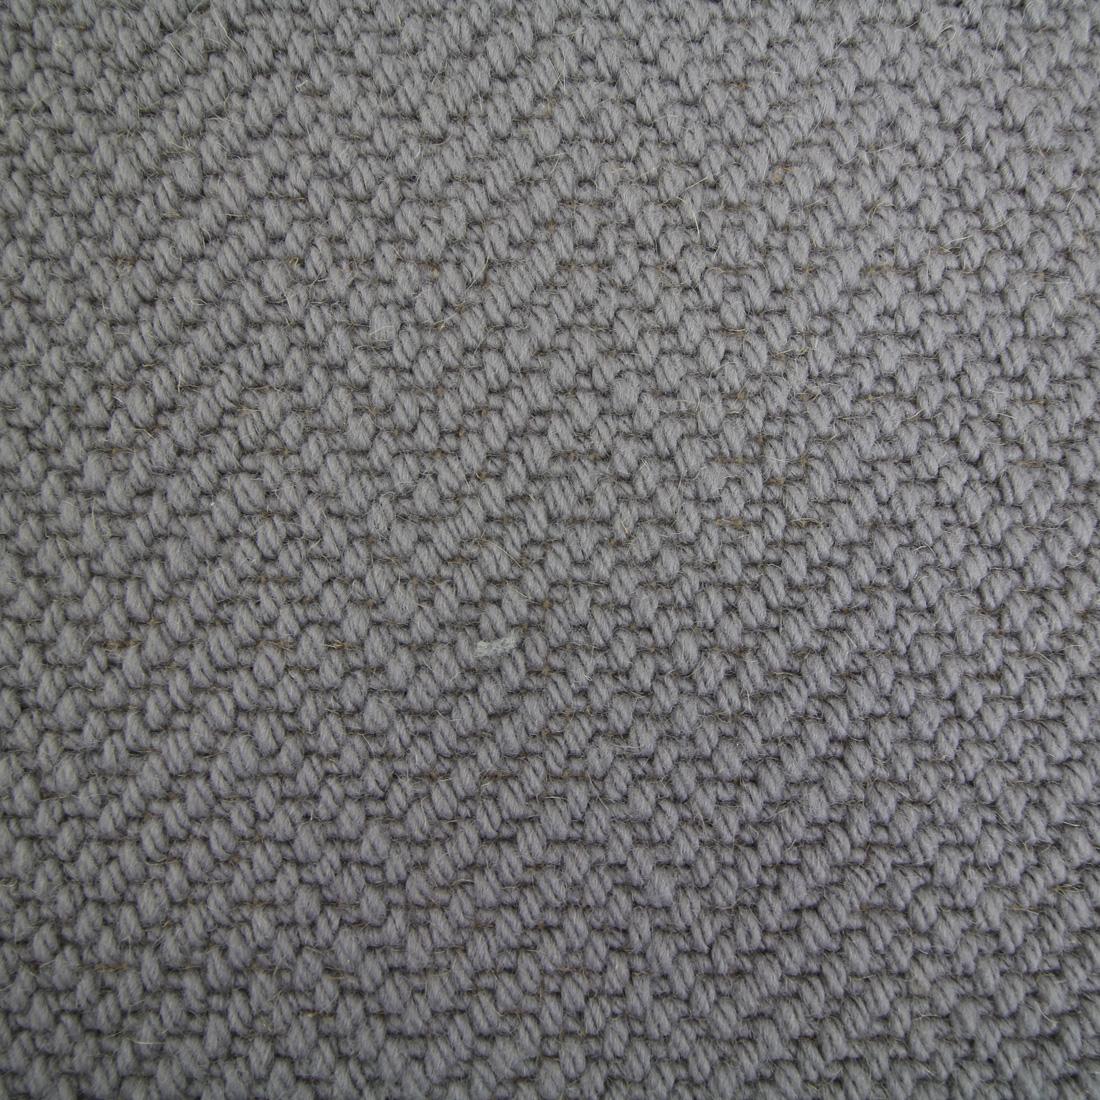 Vloerkleed Kansas (wol) Grijs | 200 x 300 cm